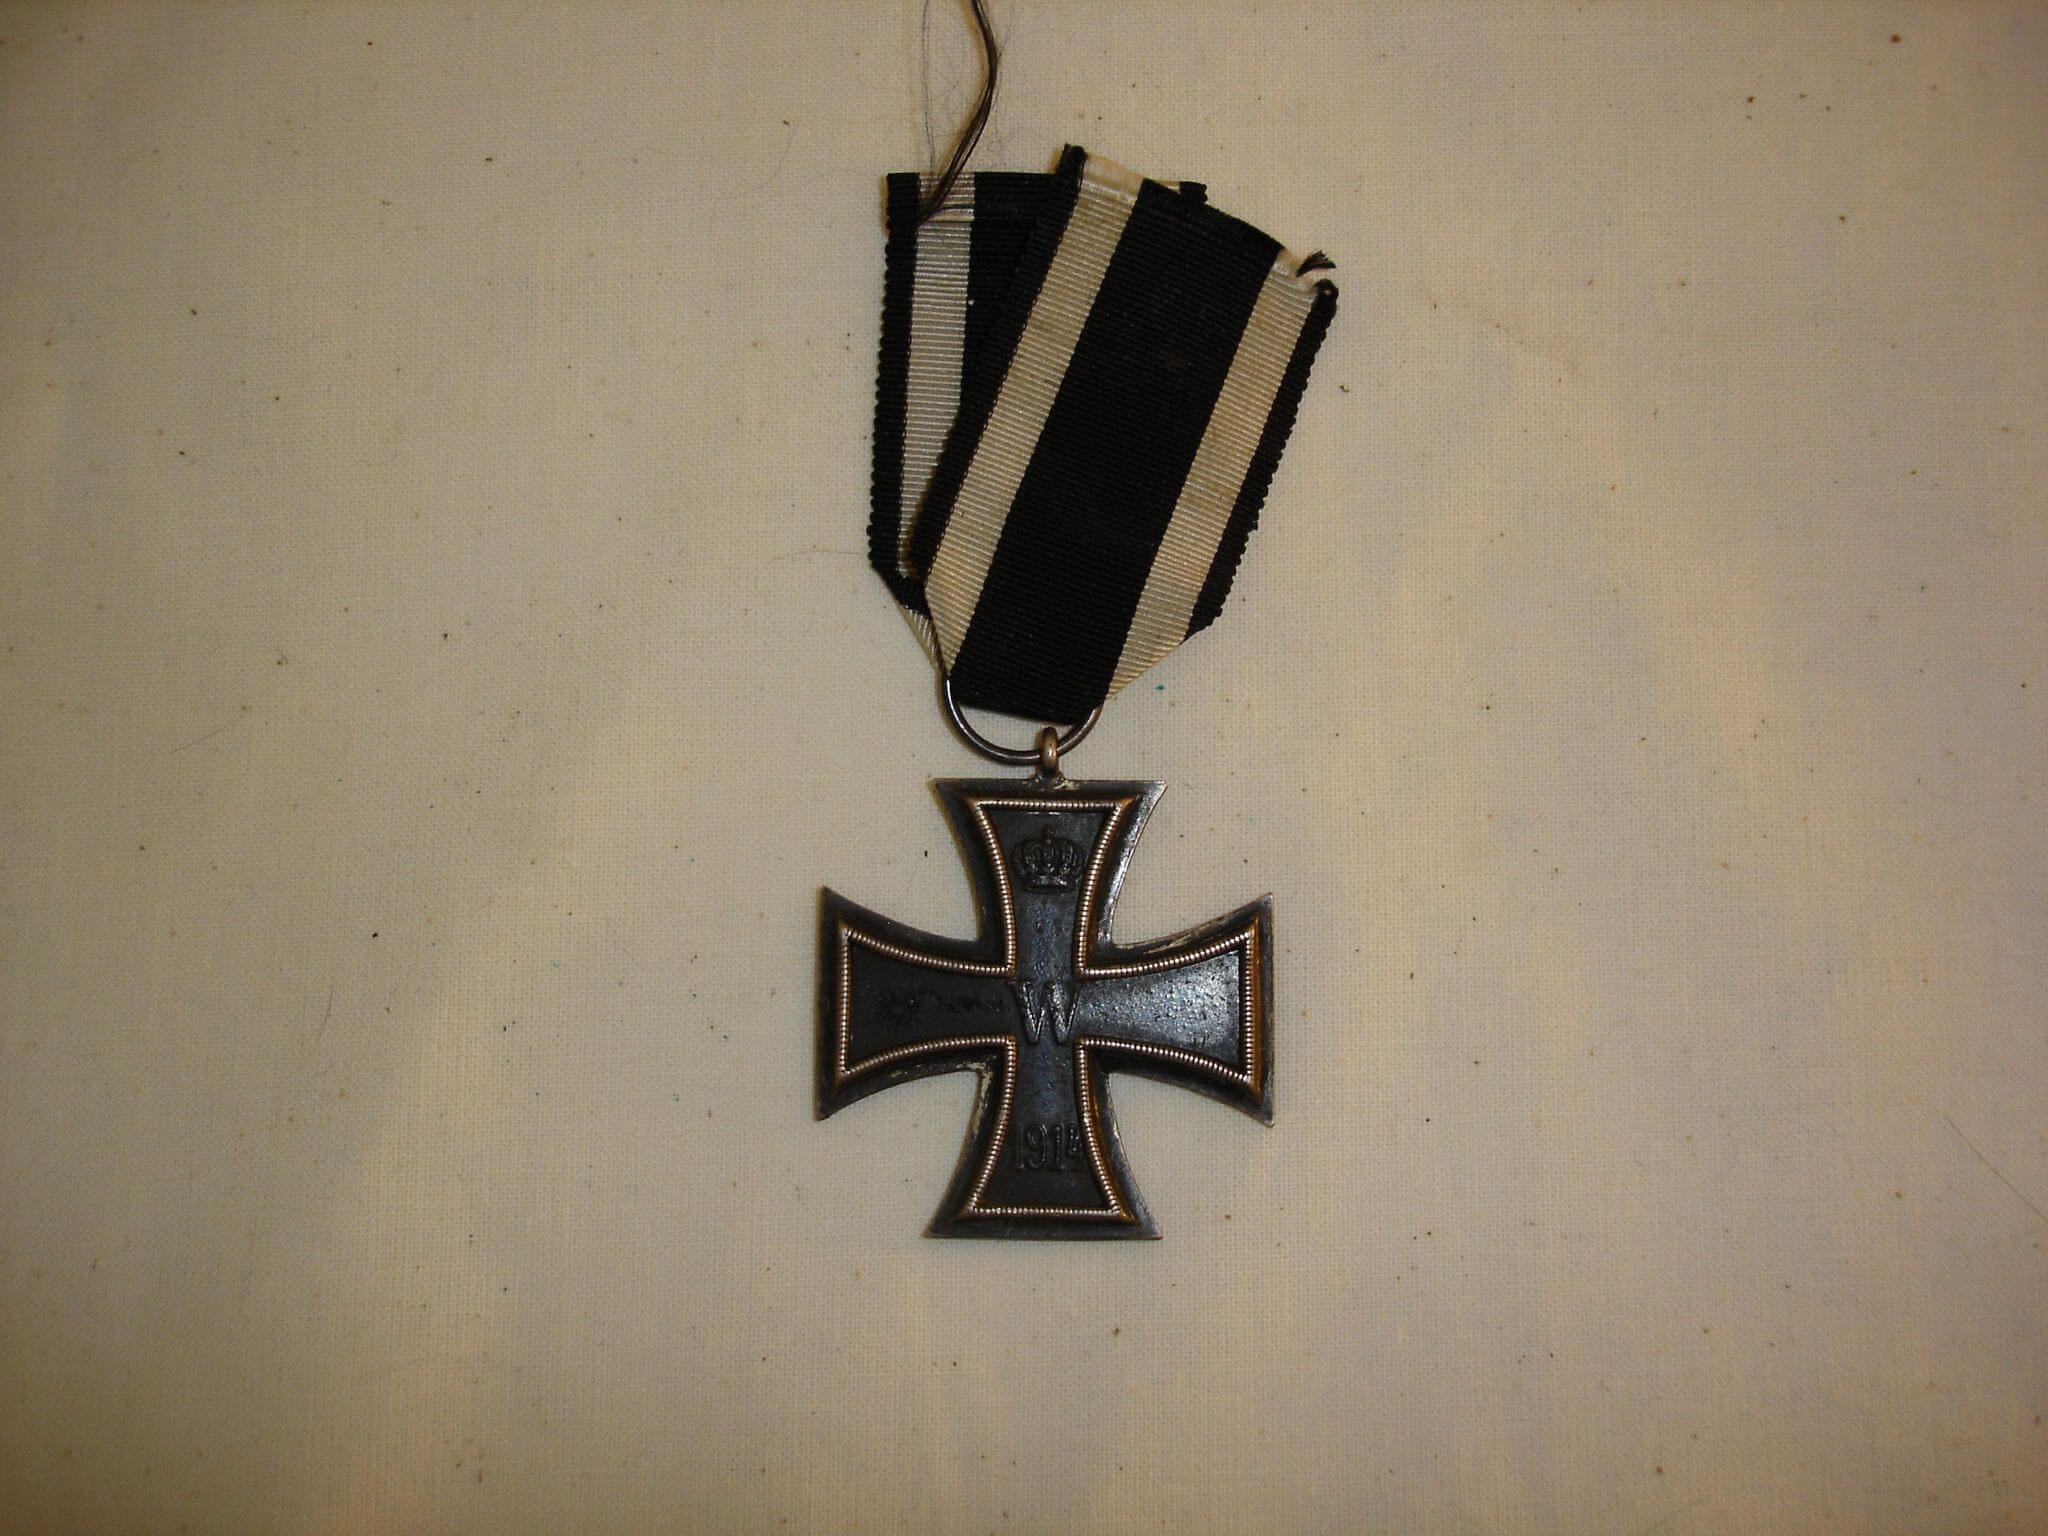 Duits ijzeren kruis 1813 1914 wo1